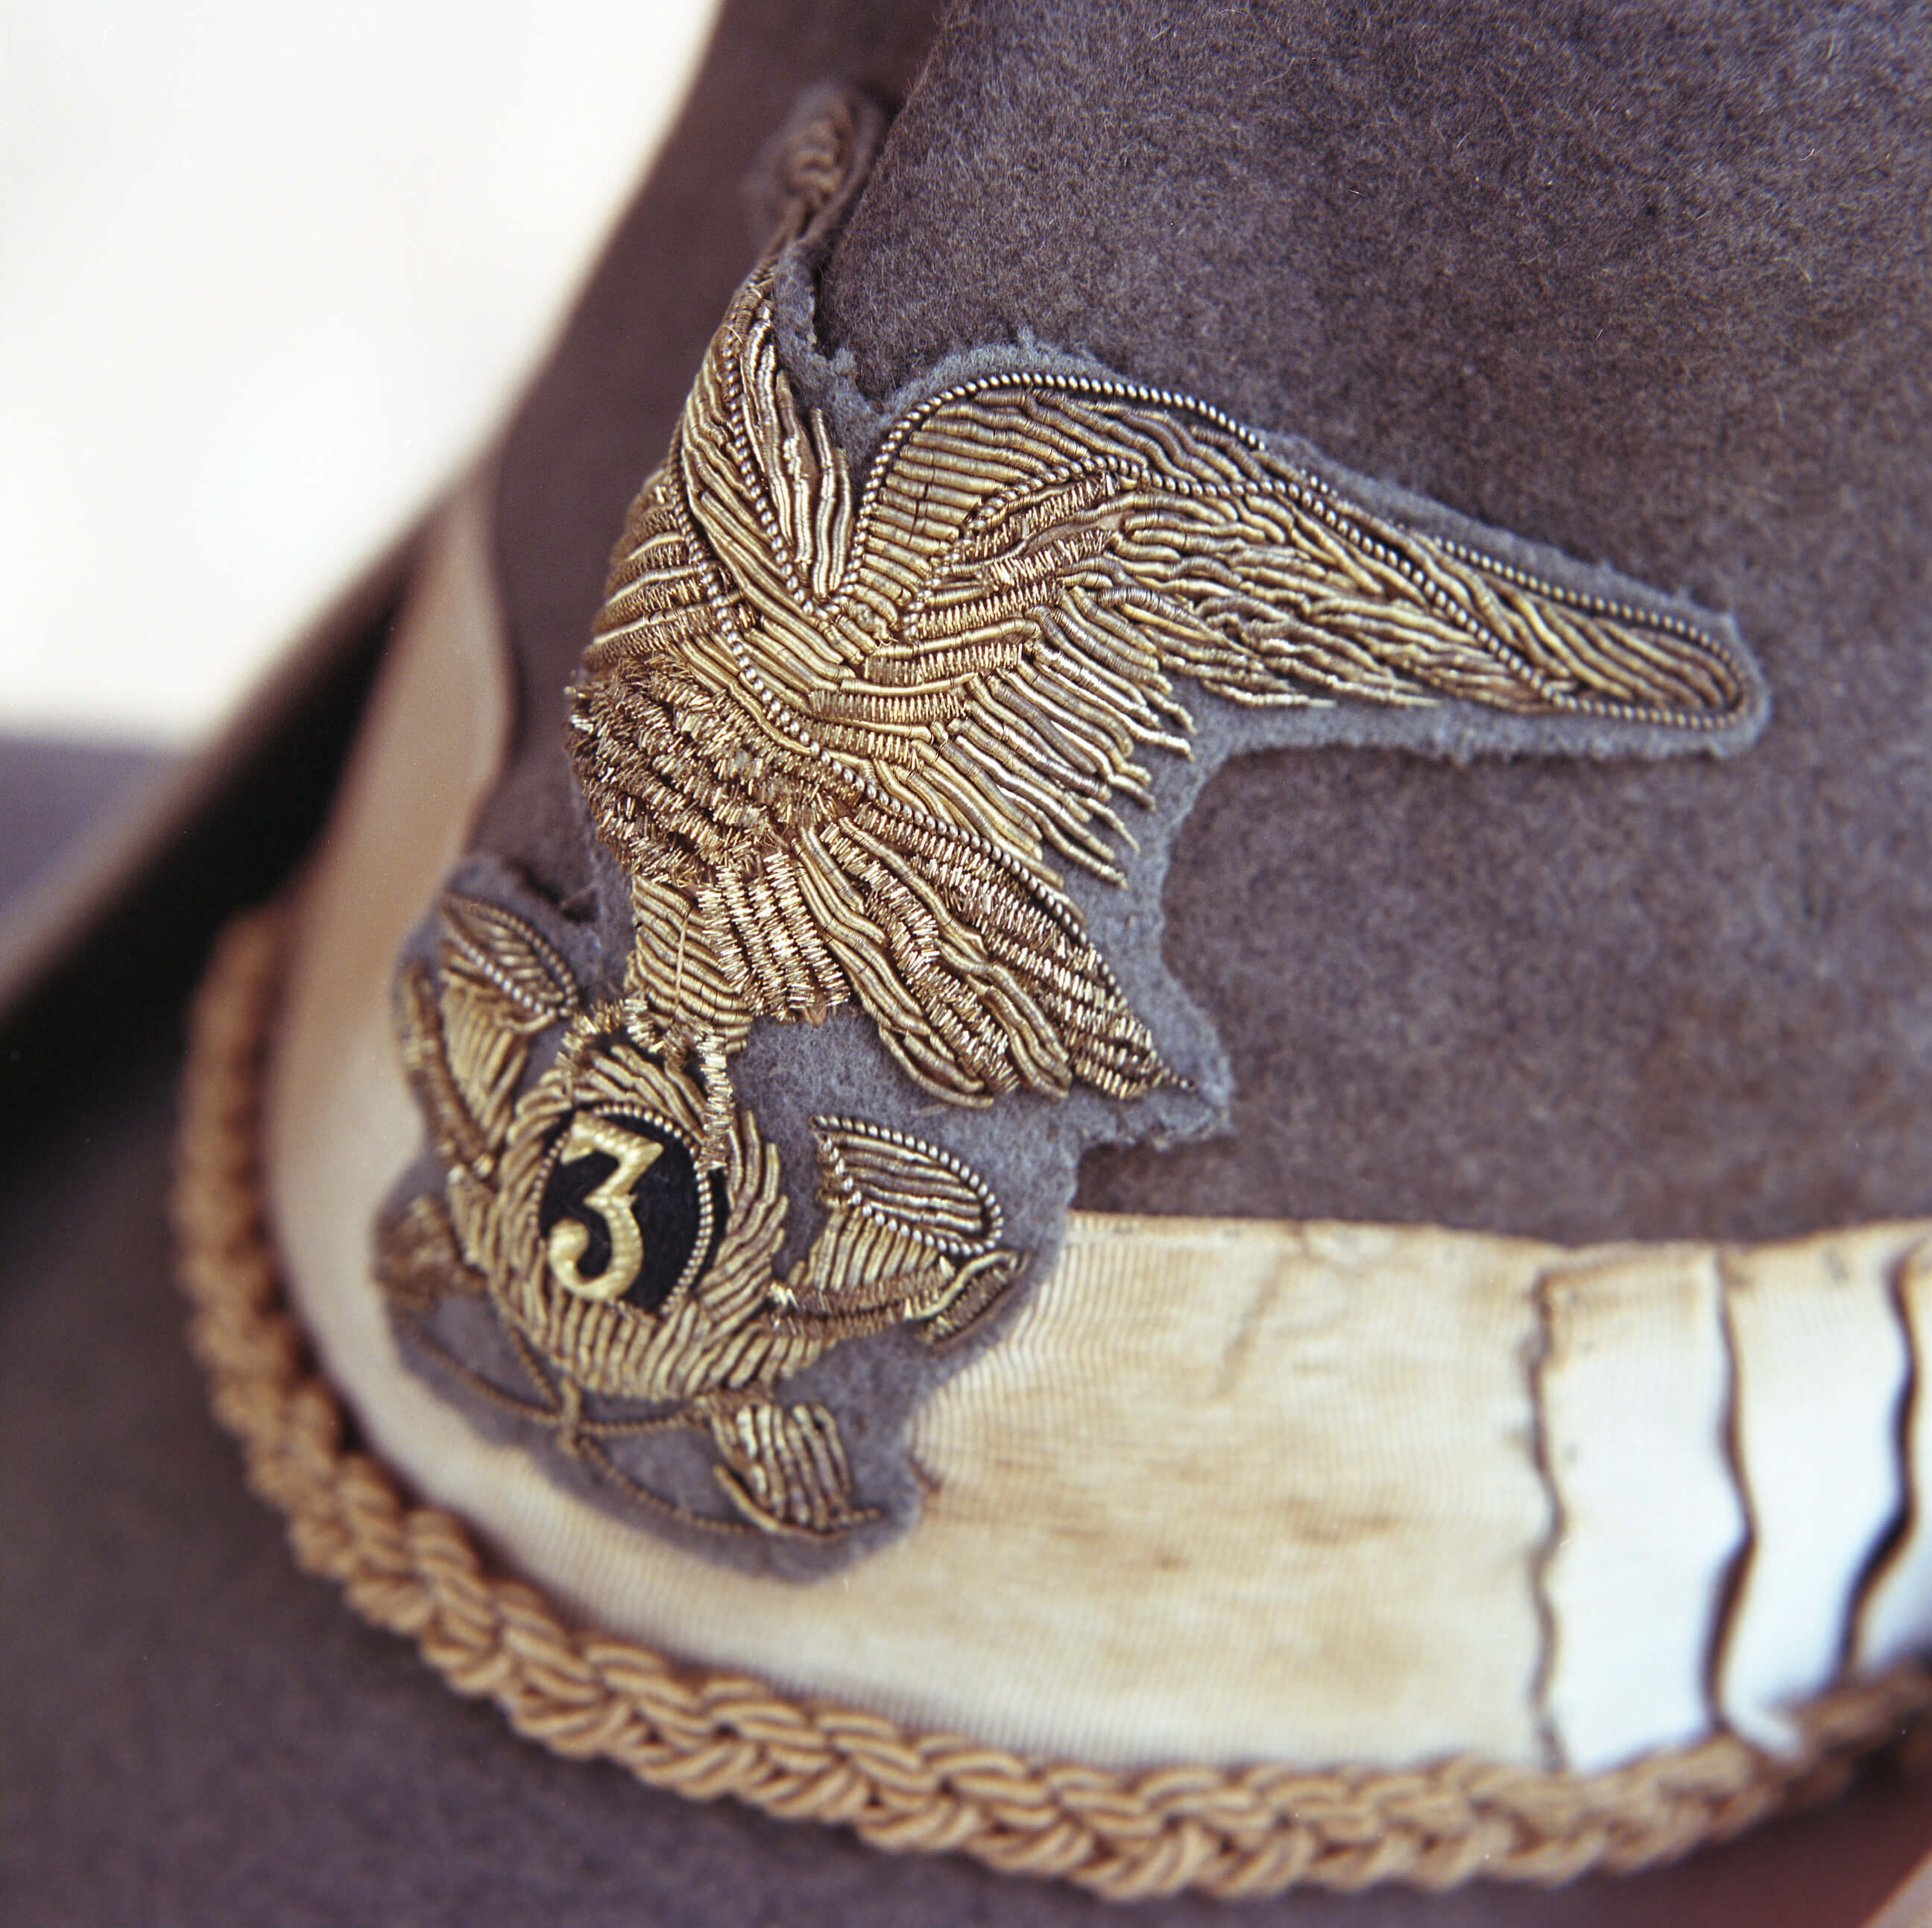 Giulia Simonotti SIAMO TUTTI ALPINI the south west collective of photography photo of badge on hat